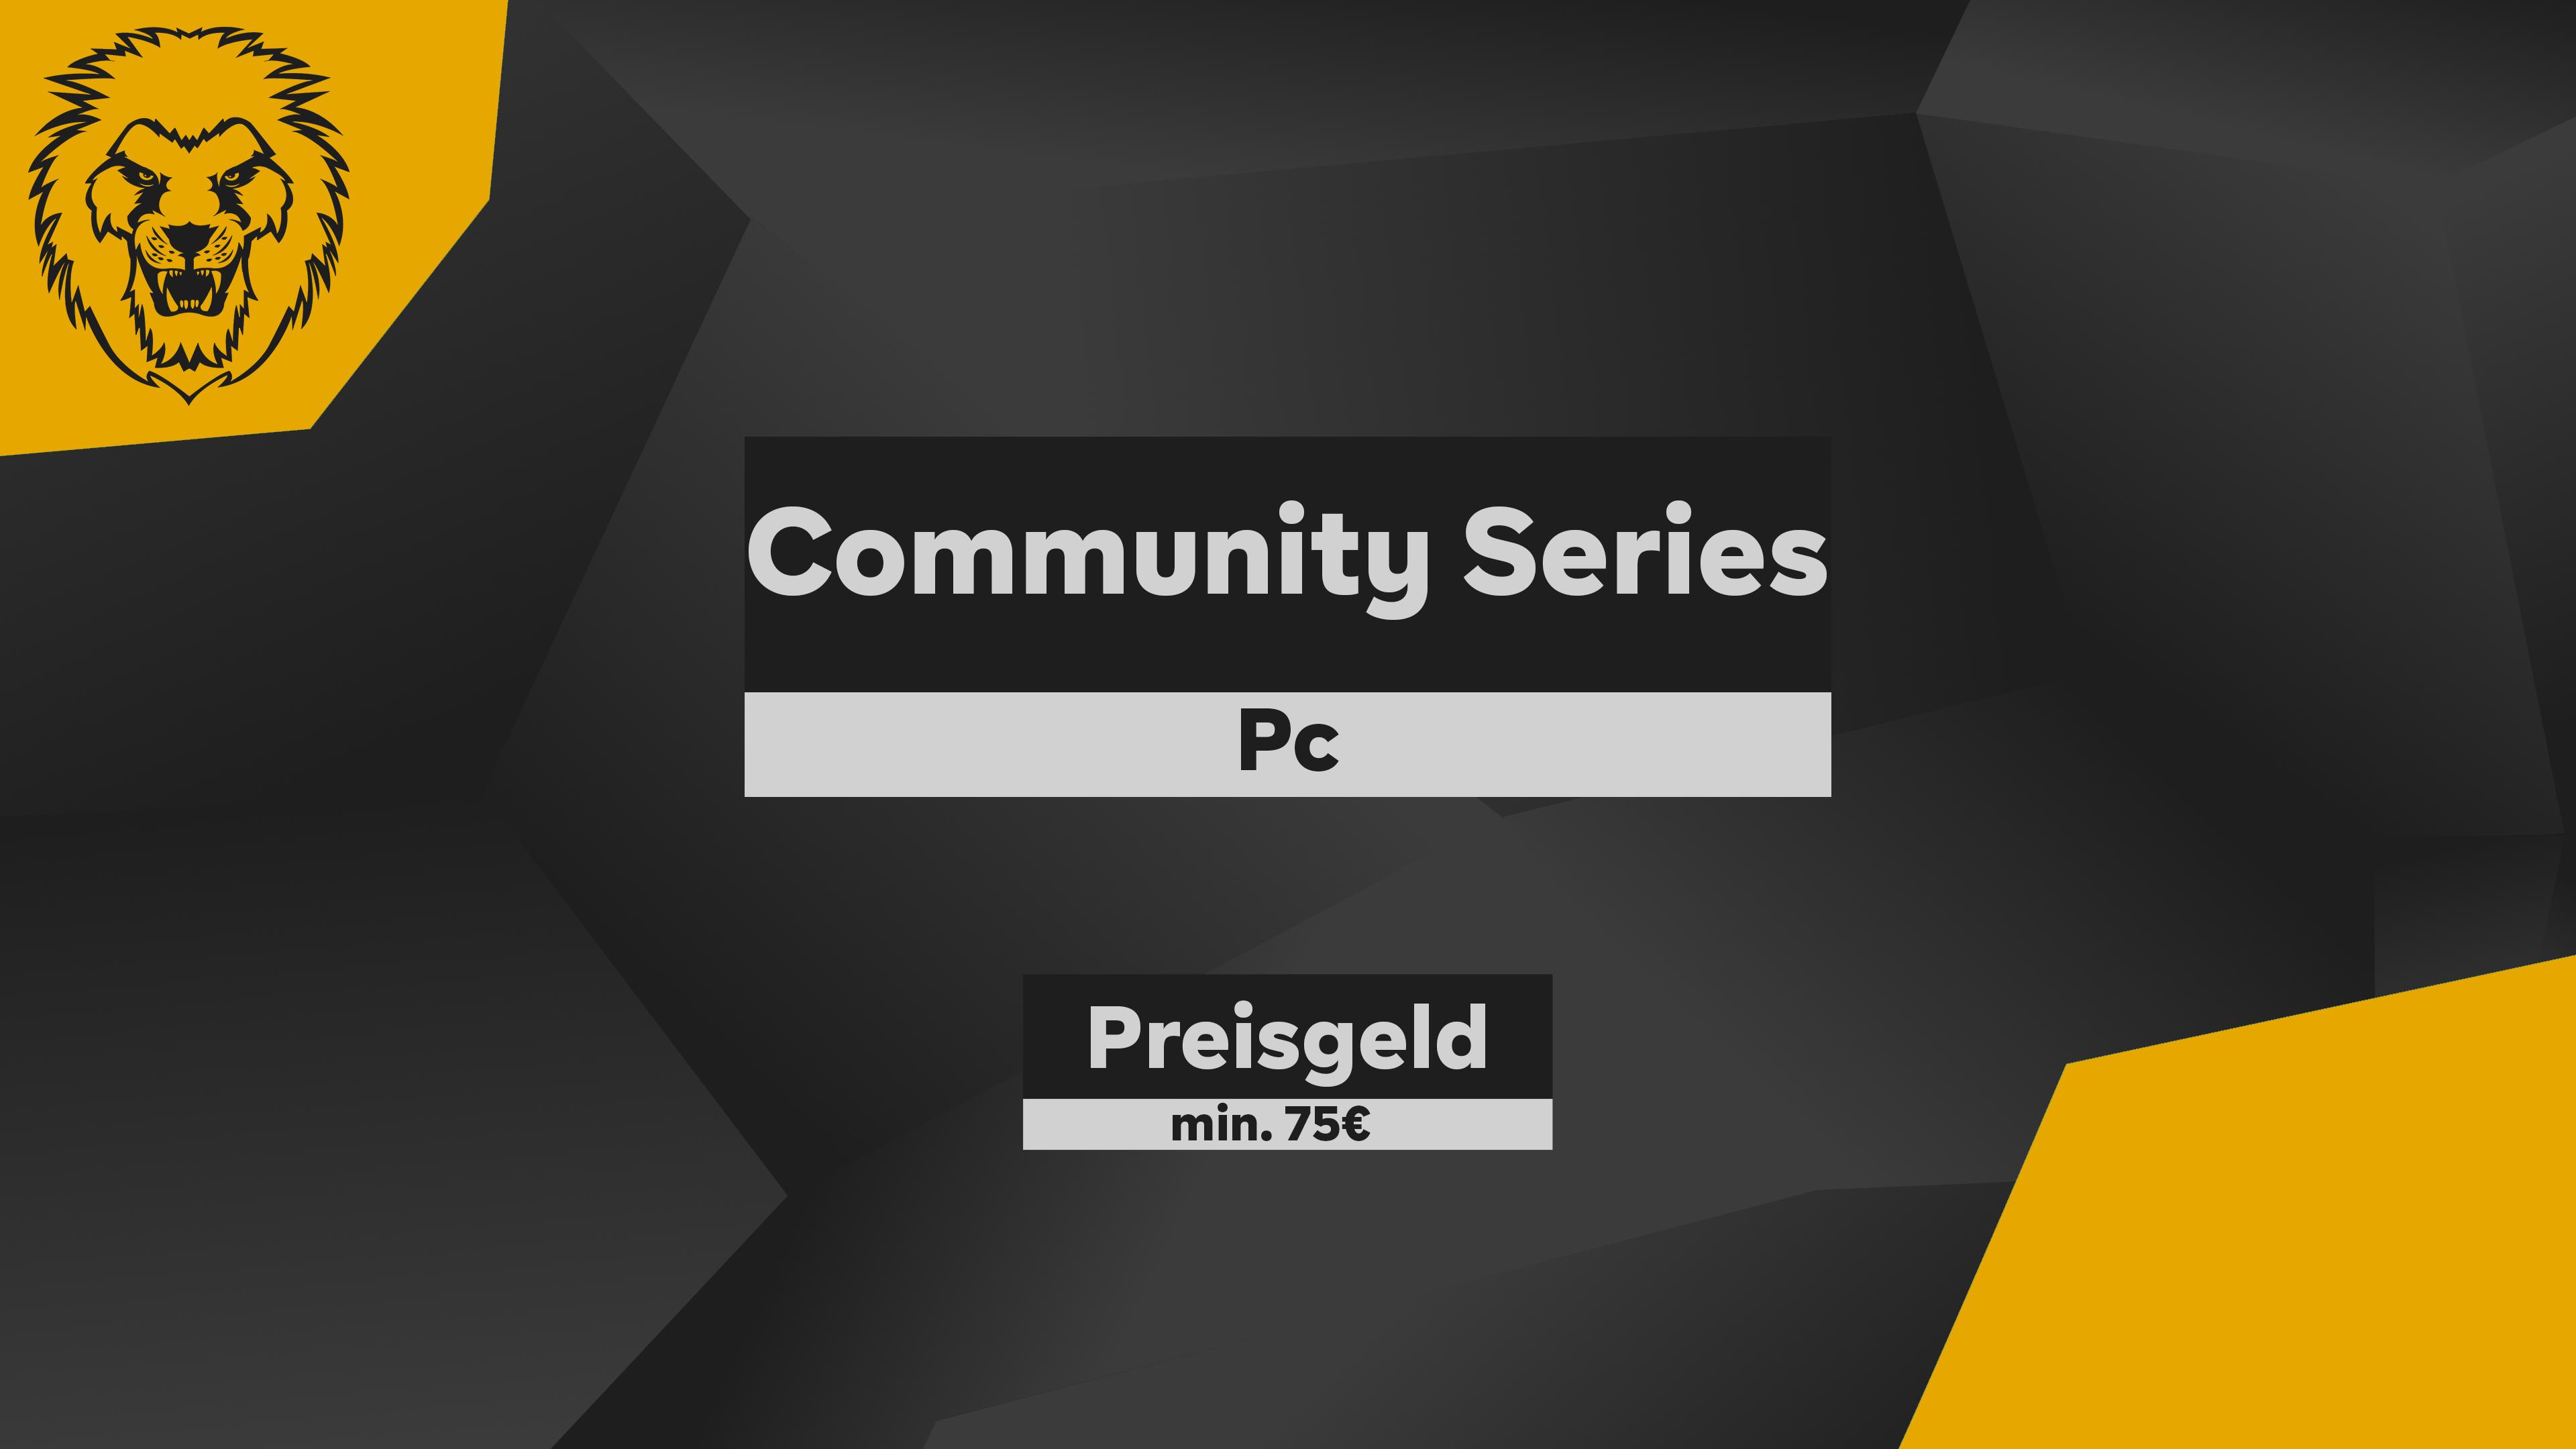 Logo Liga German Community Series #1 Pc ORANGE